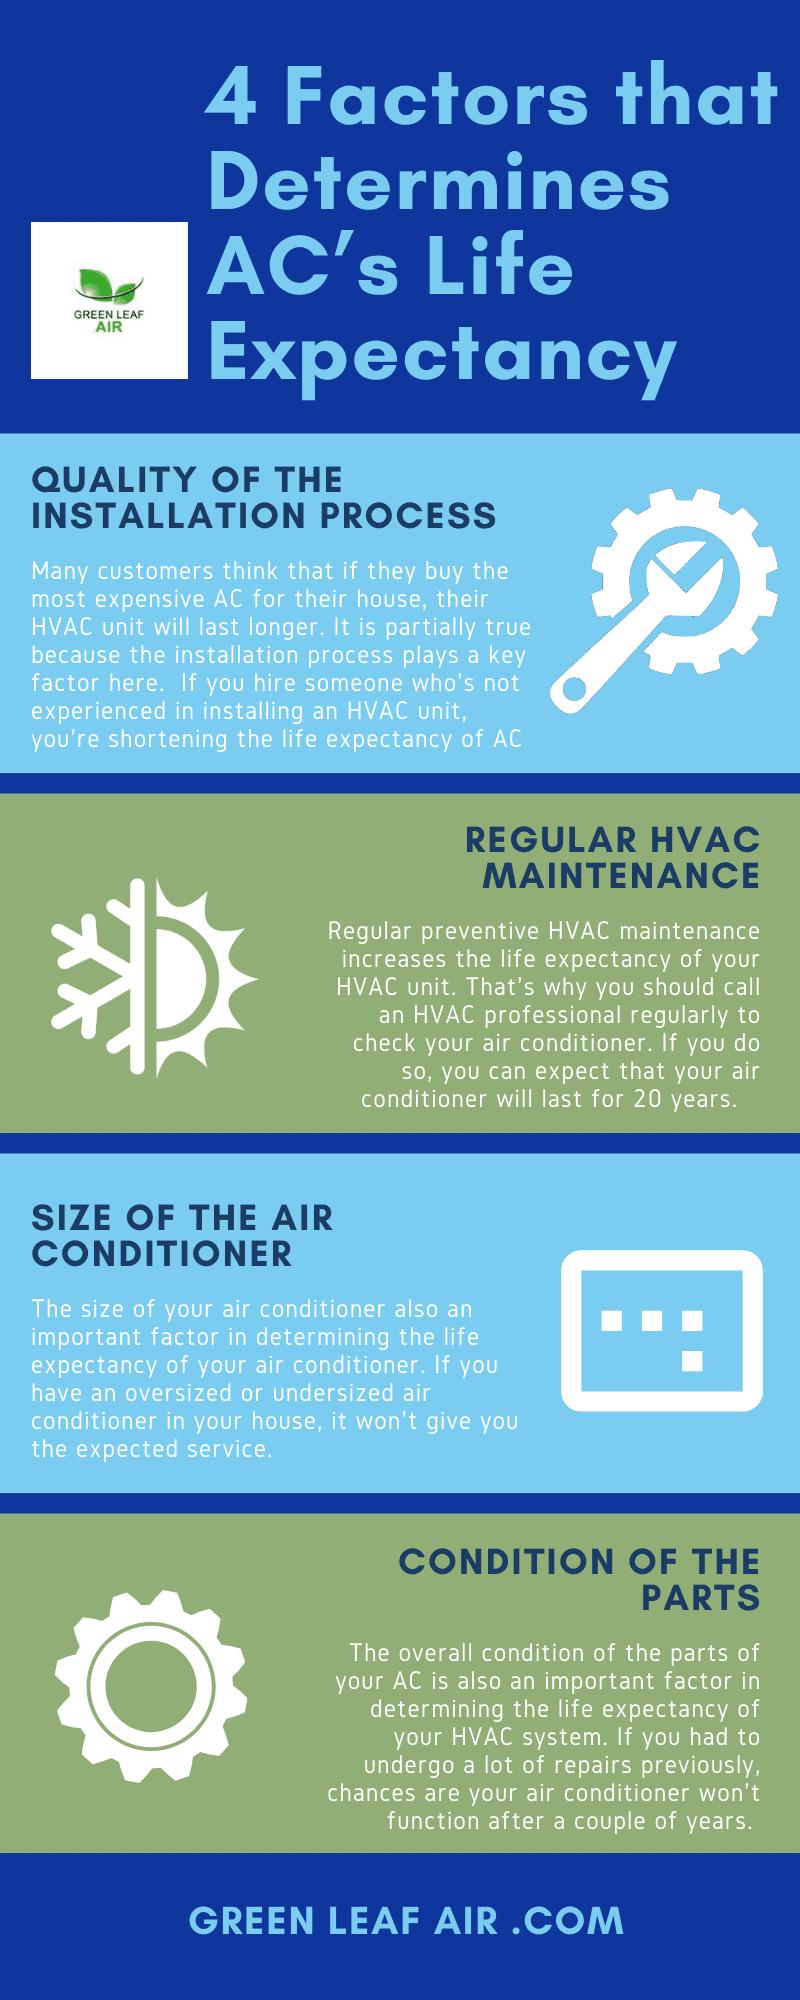 4 Factors that Determines AC's Life Expectancy